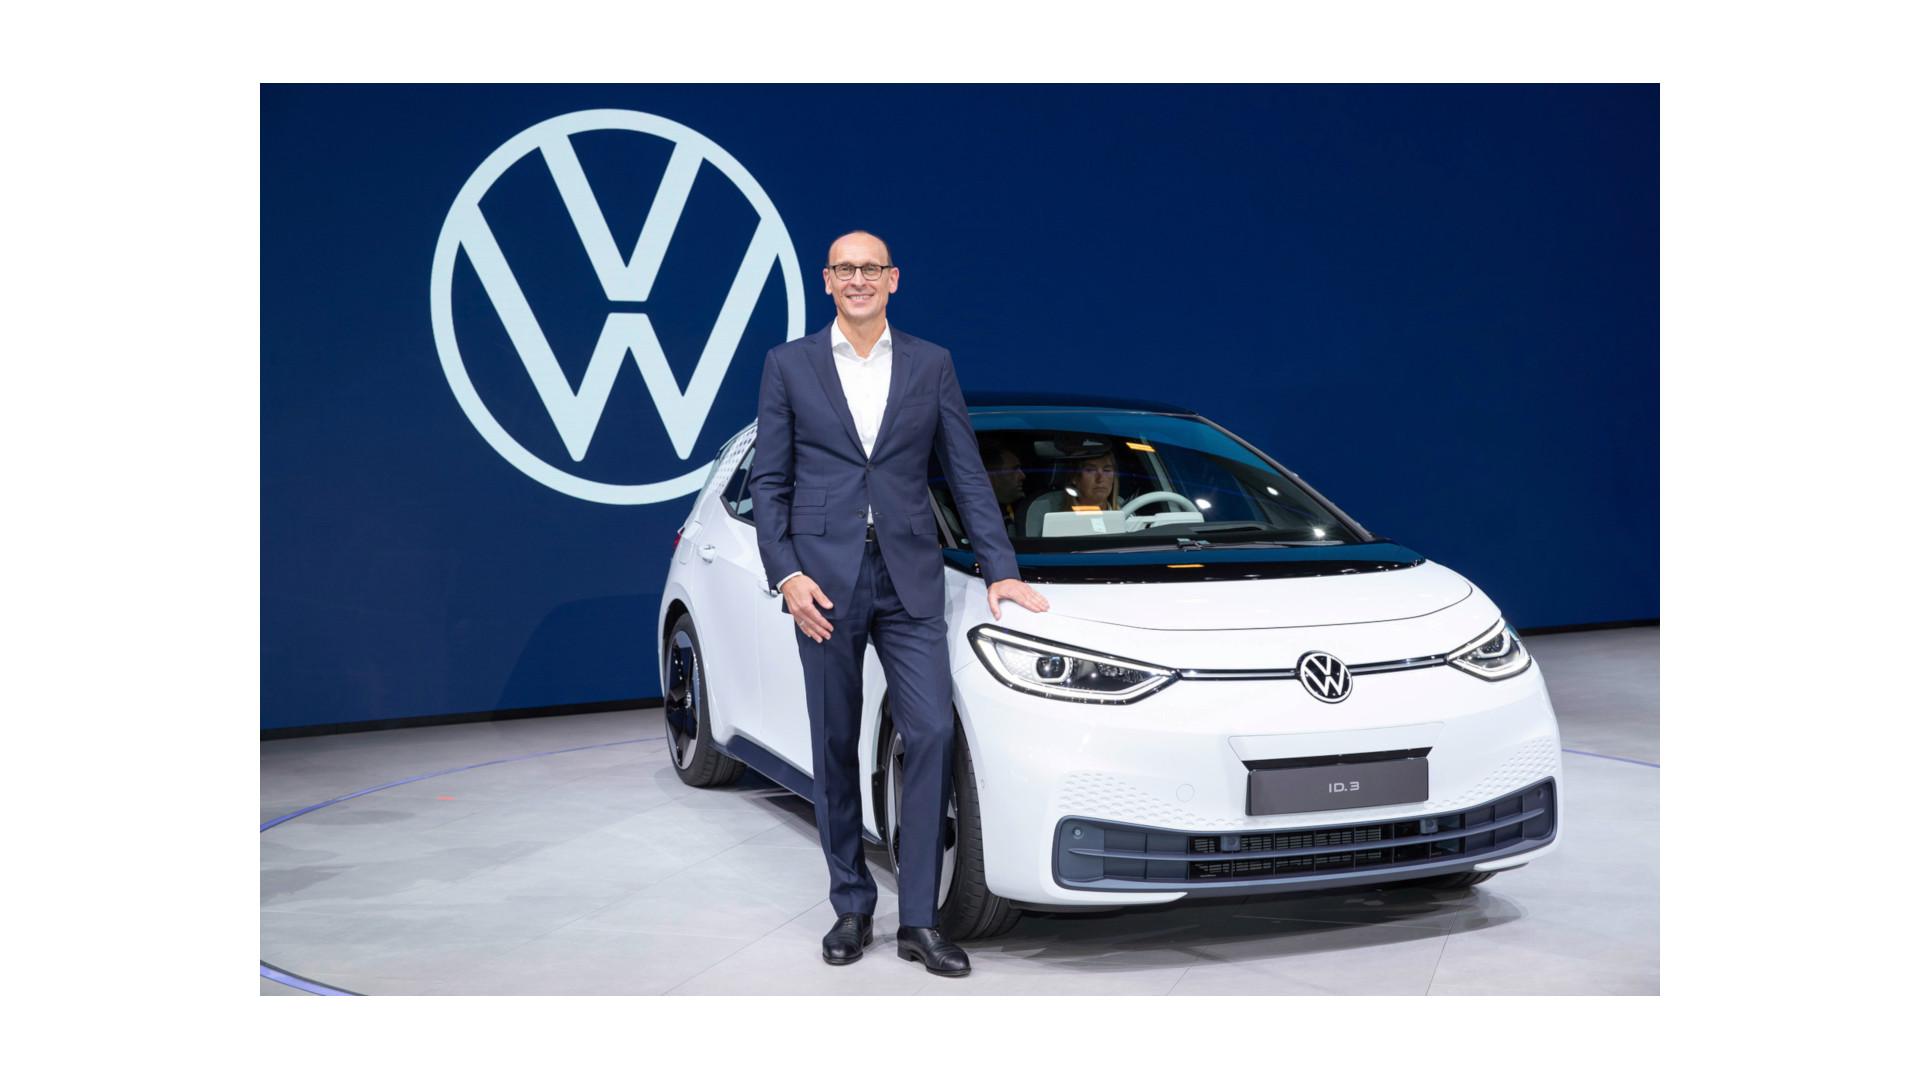 Ralf Brandsttätter dirigirá la marca Volkswagen